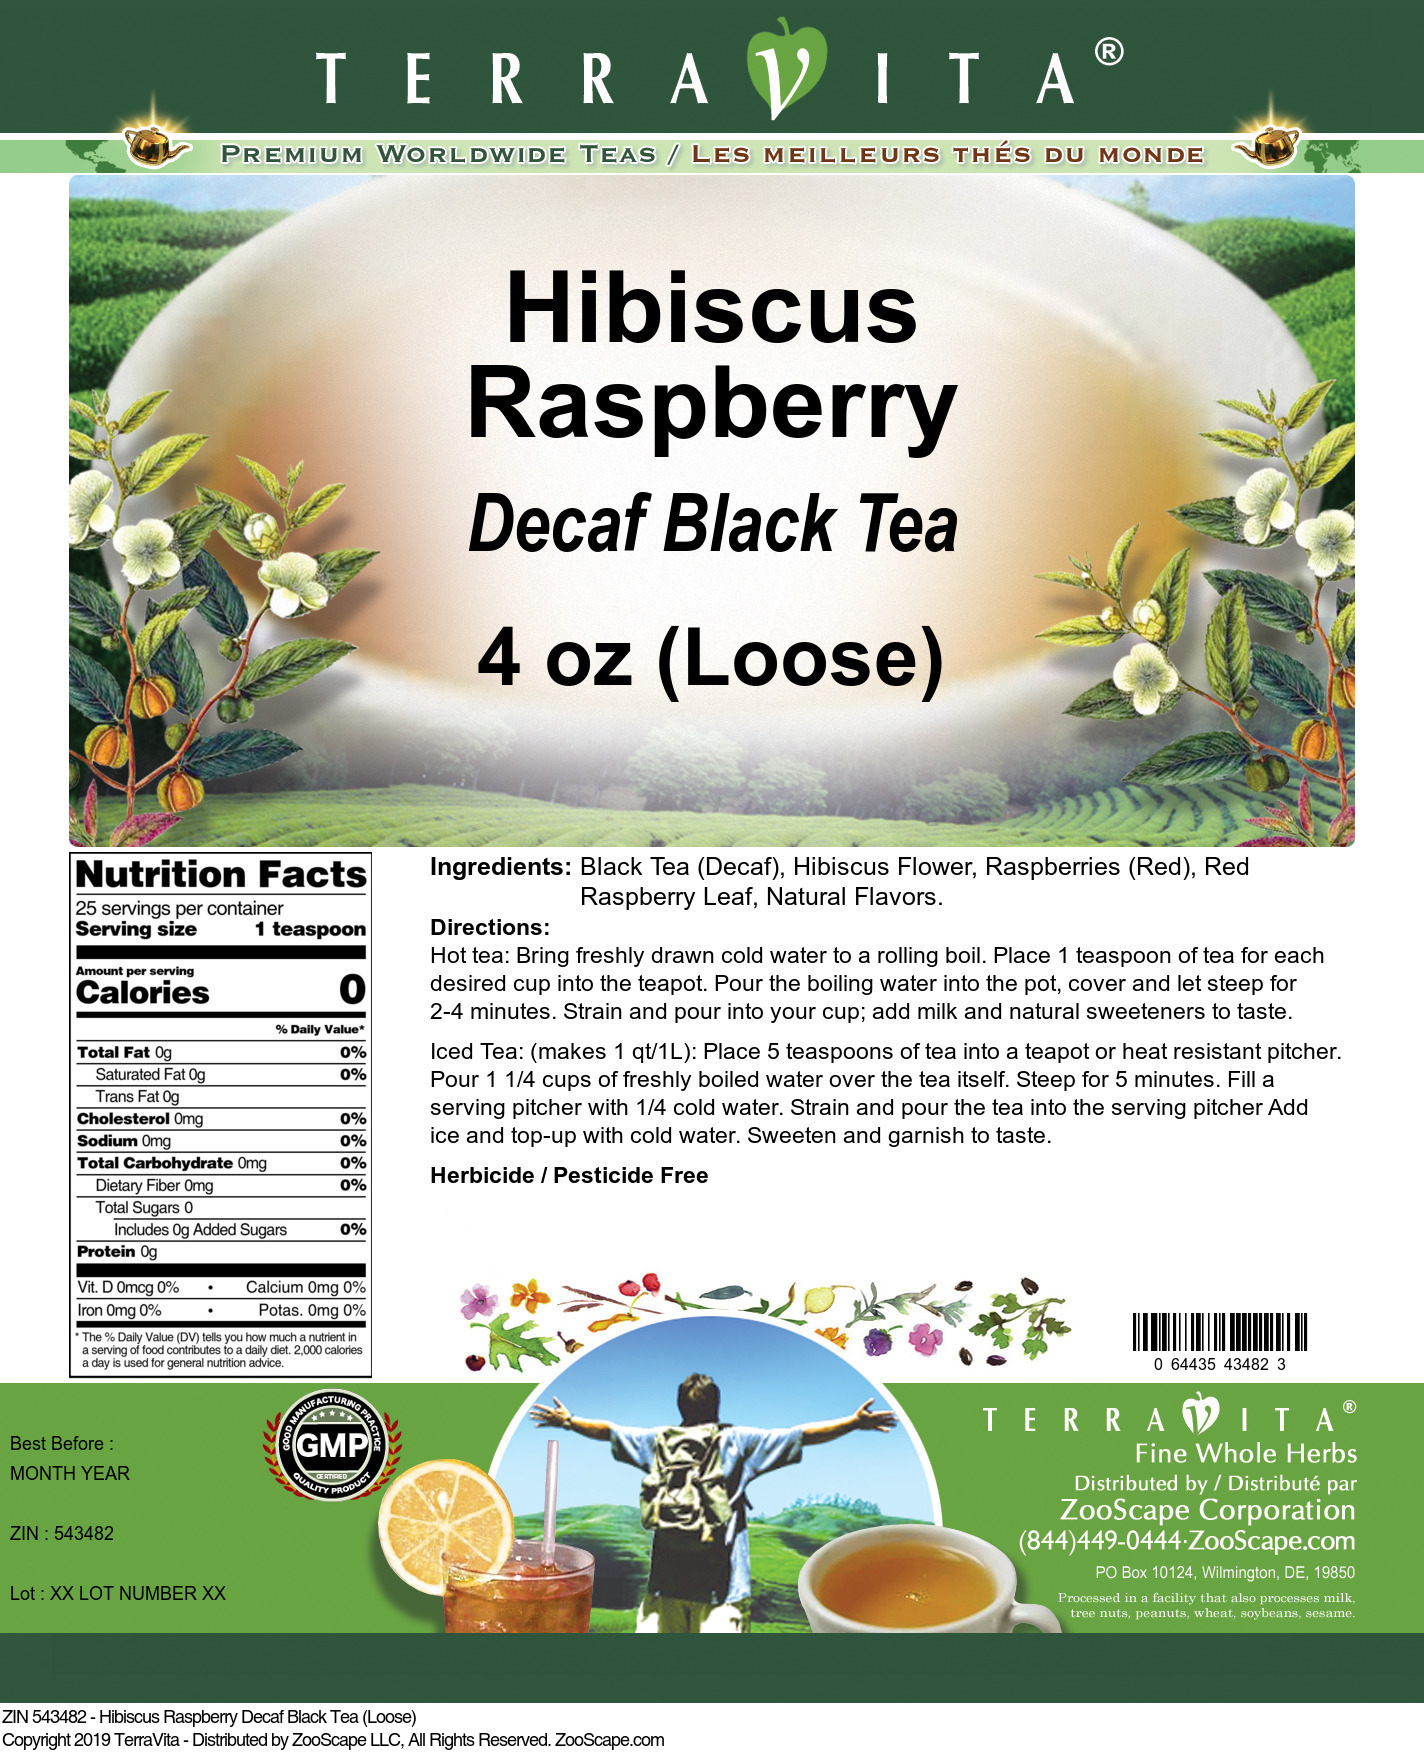 Hibiscus Raspberry Decaf Black Tea